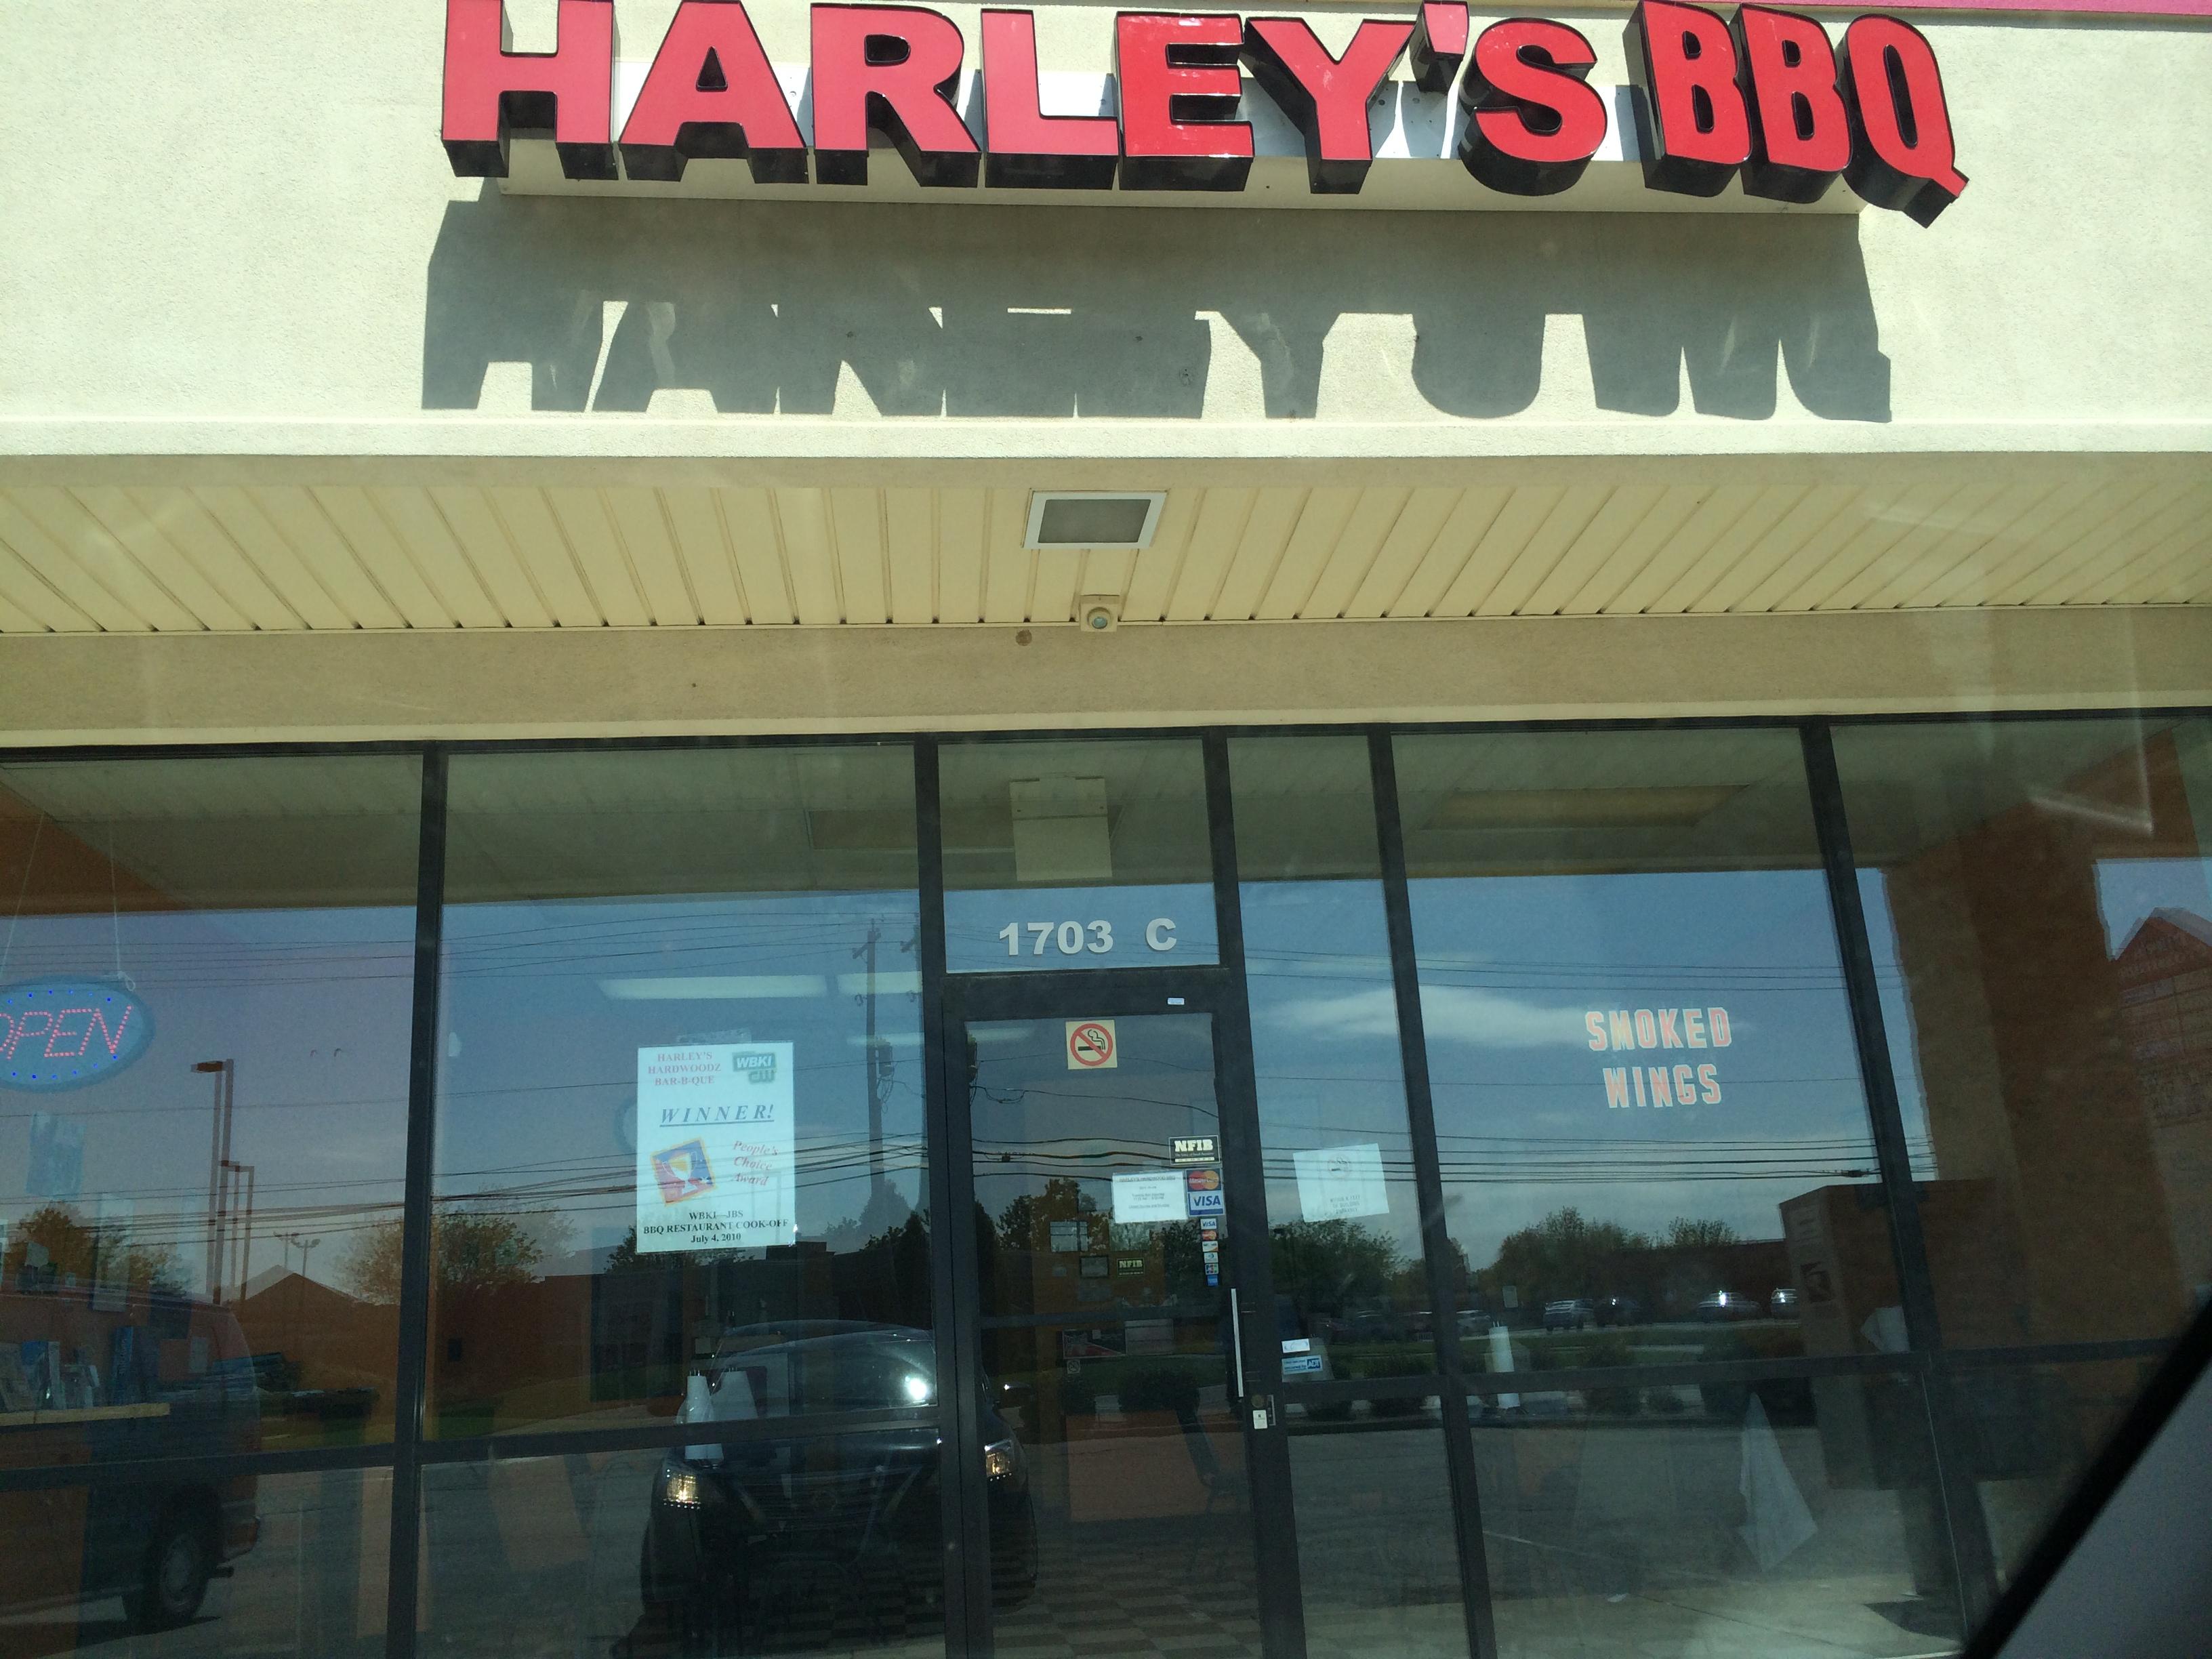 Harley's Hardwoodz BBQ